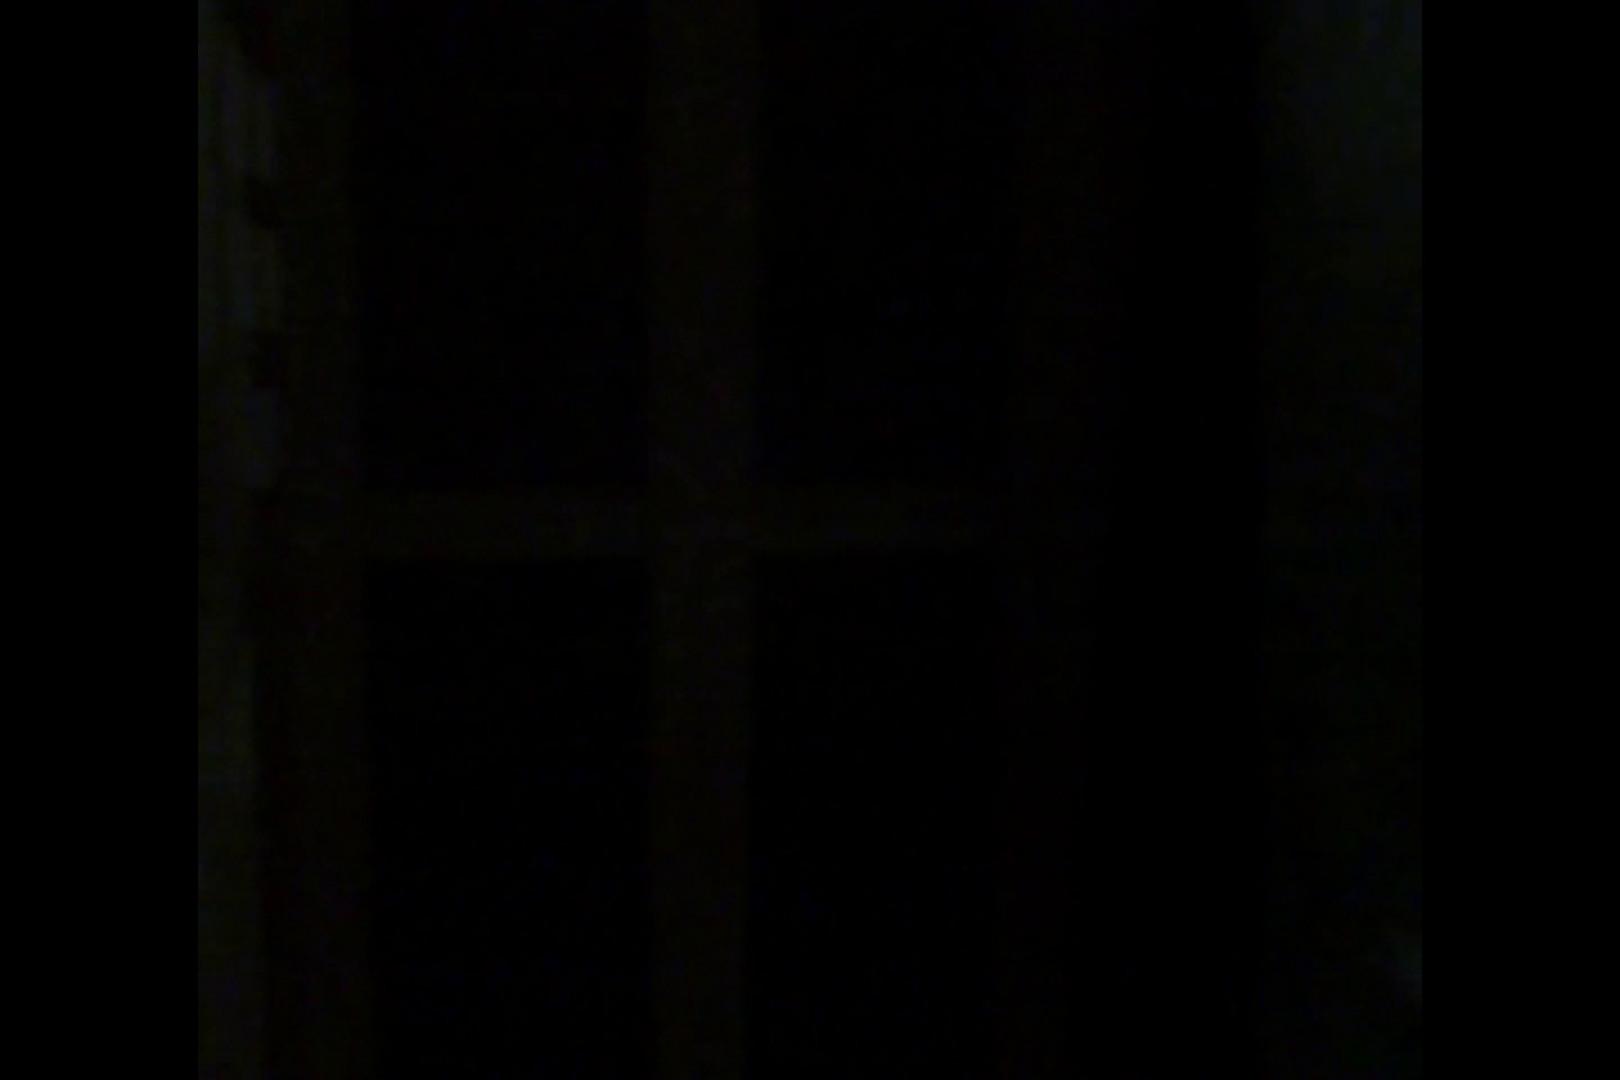 Came back チンピースさん!!vol.01 スリム美少年系ジャニ系 ゲイフリーエロ画像 11画像 3